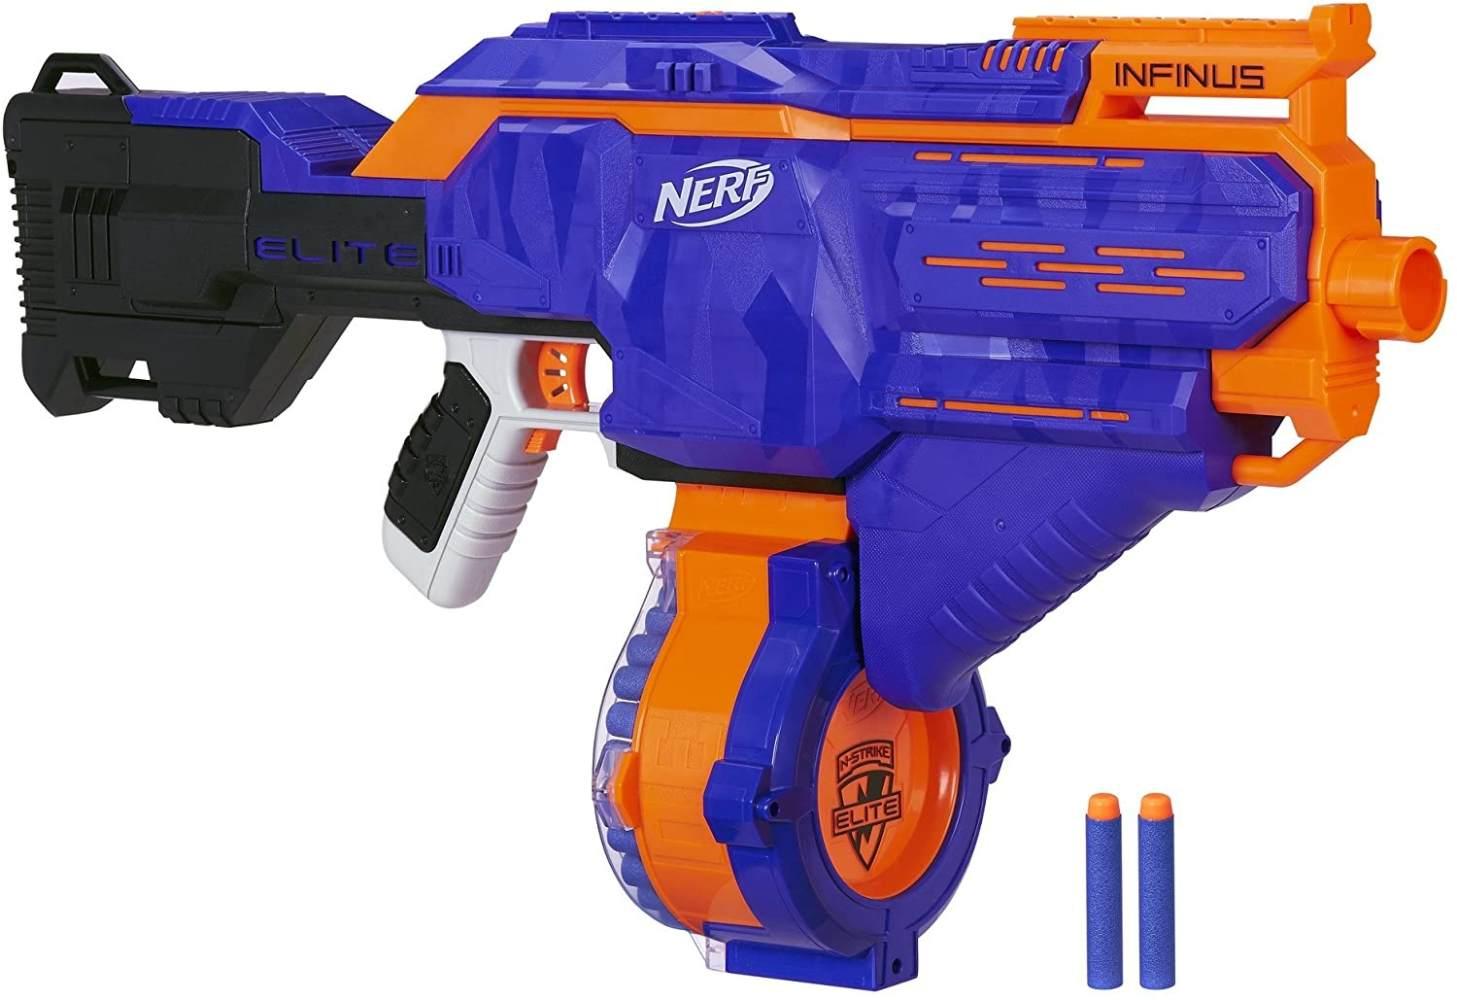 Nerf Strike Elite Infinus Blaster Bild 1